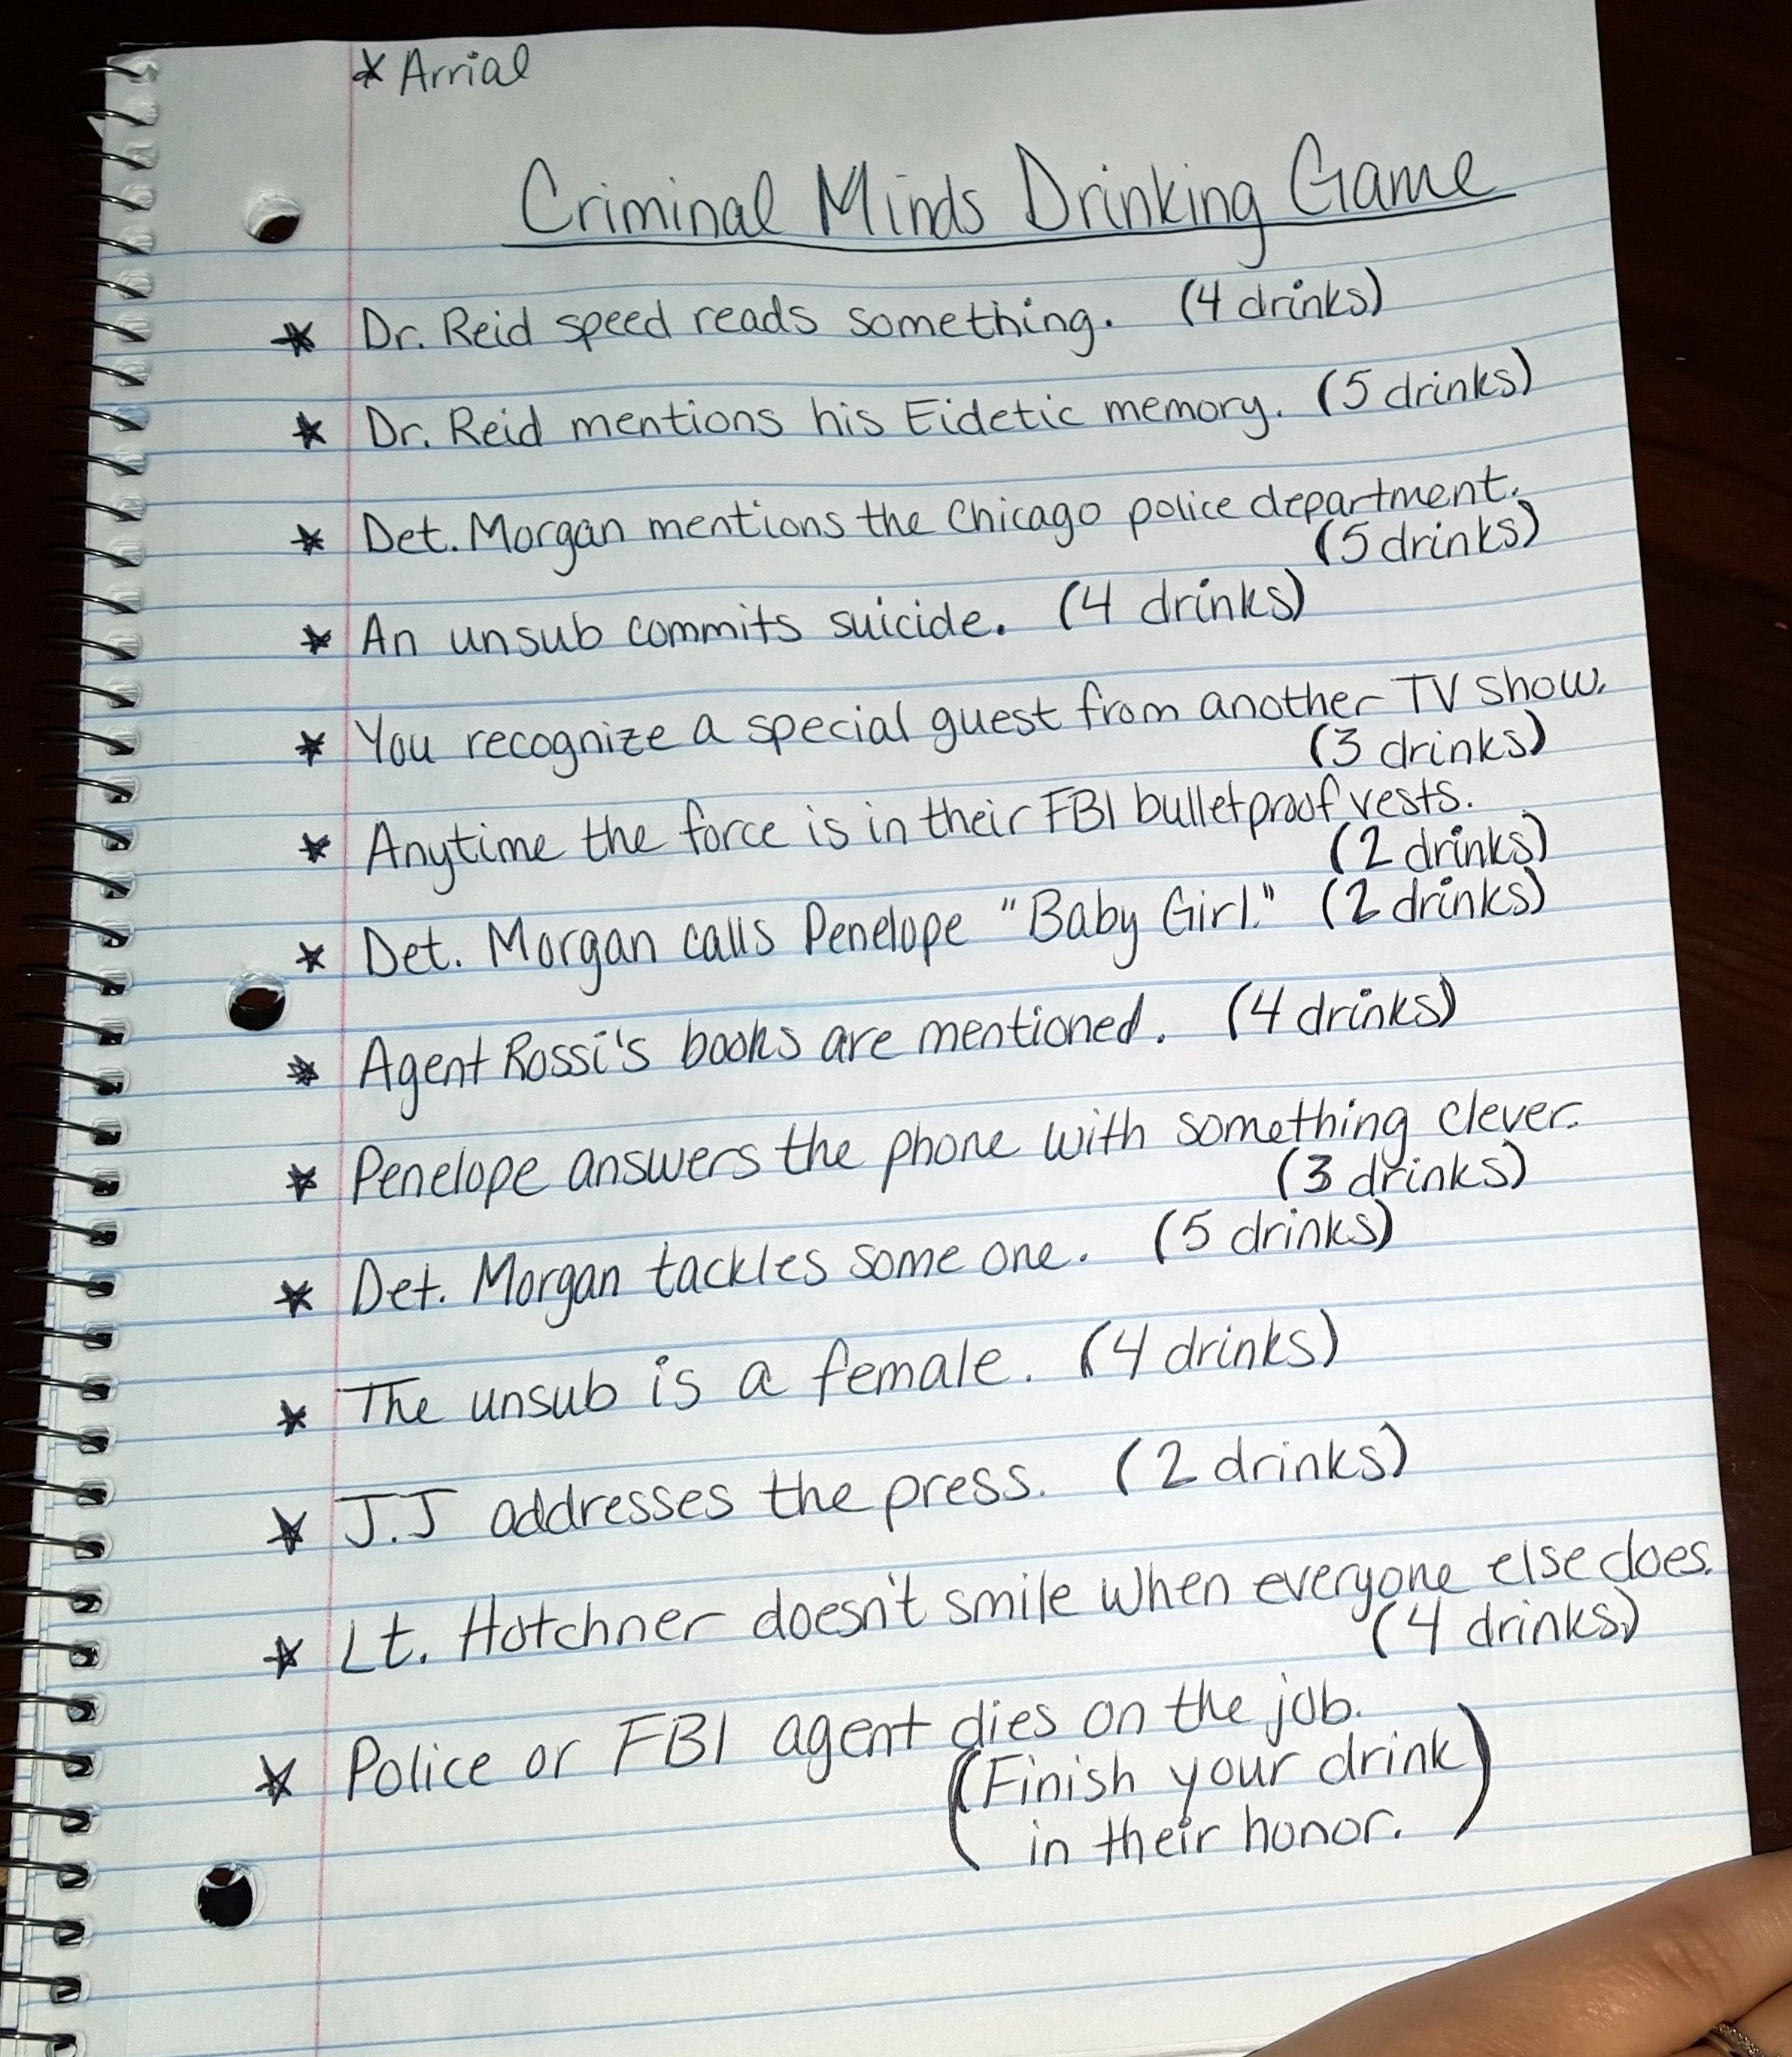 Criminal Minds Drinking Game Rules